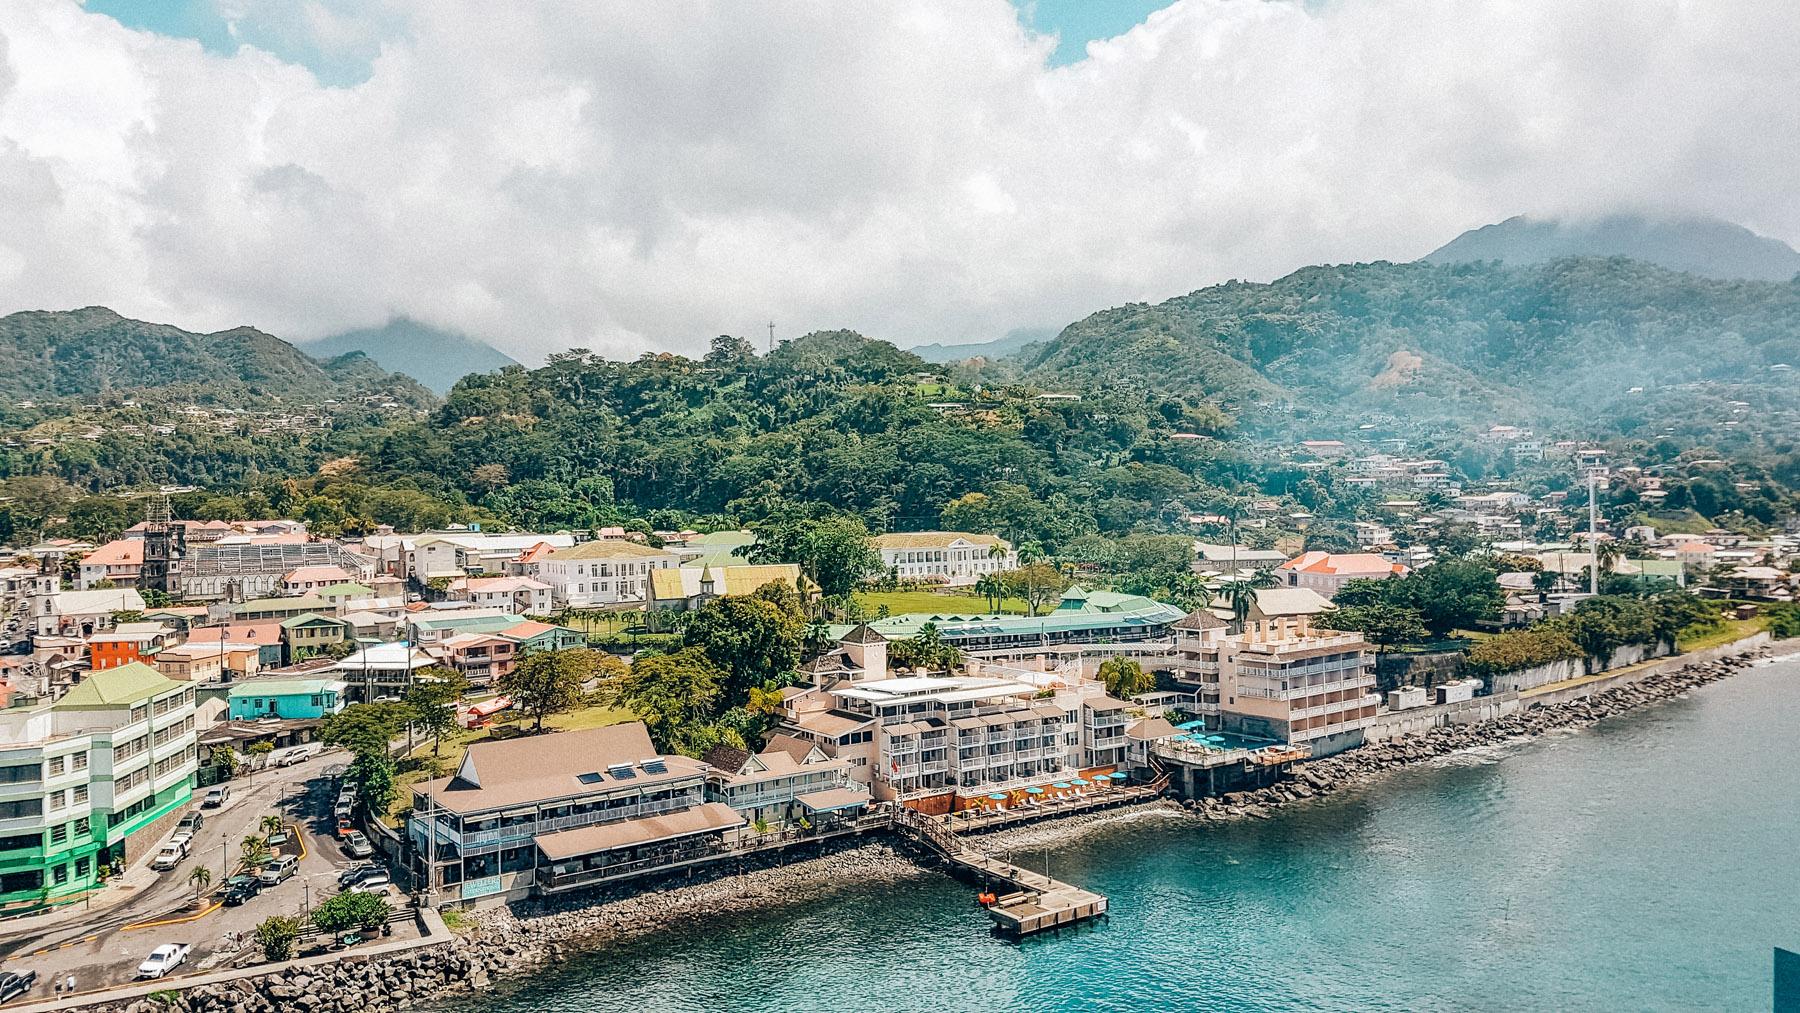 Dominica Karibik Kreuzfahrt Roseau Hauptstadt Aussicht